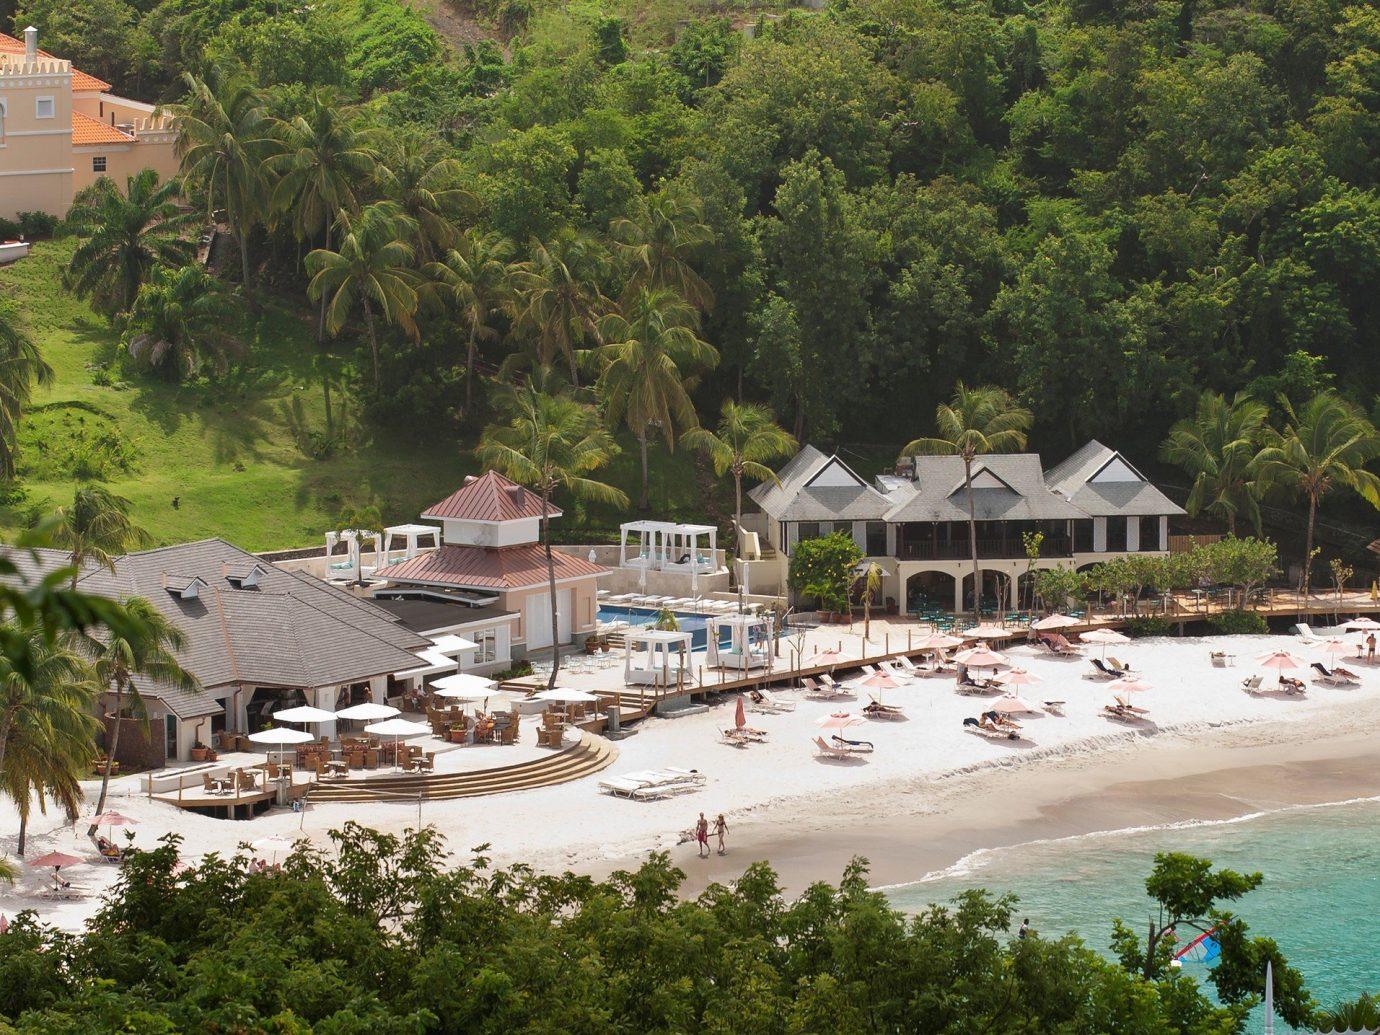 leisure Resort water recreation tree landscape